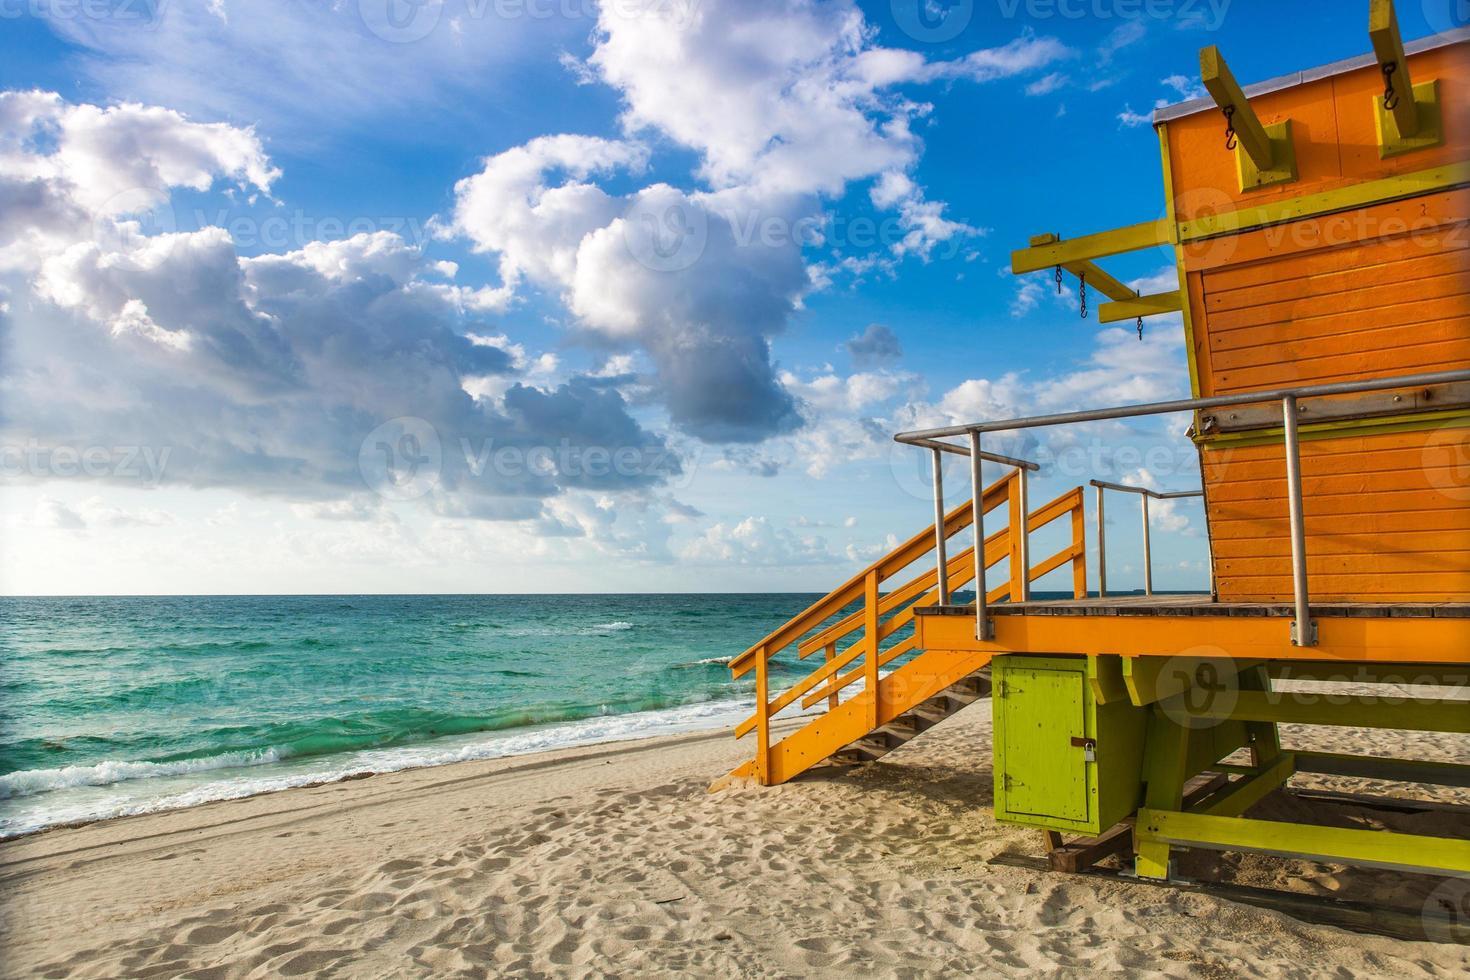 bagnino, miami beach, florida, america, stati uniti - stock im foto